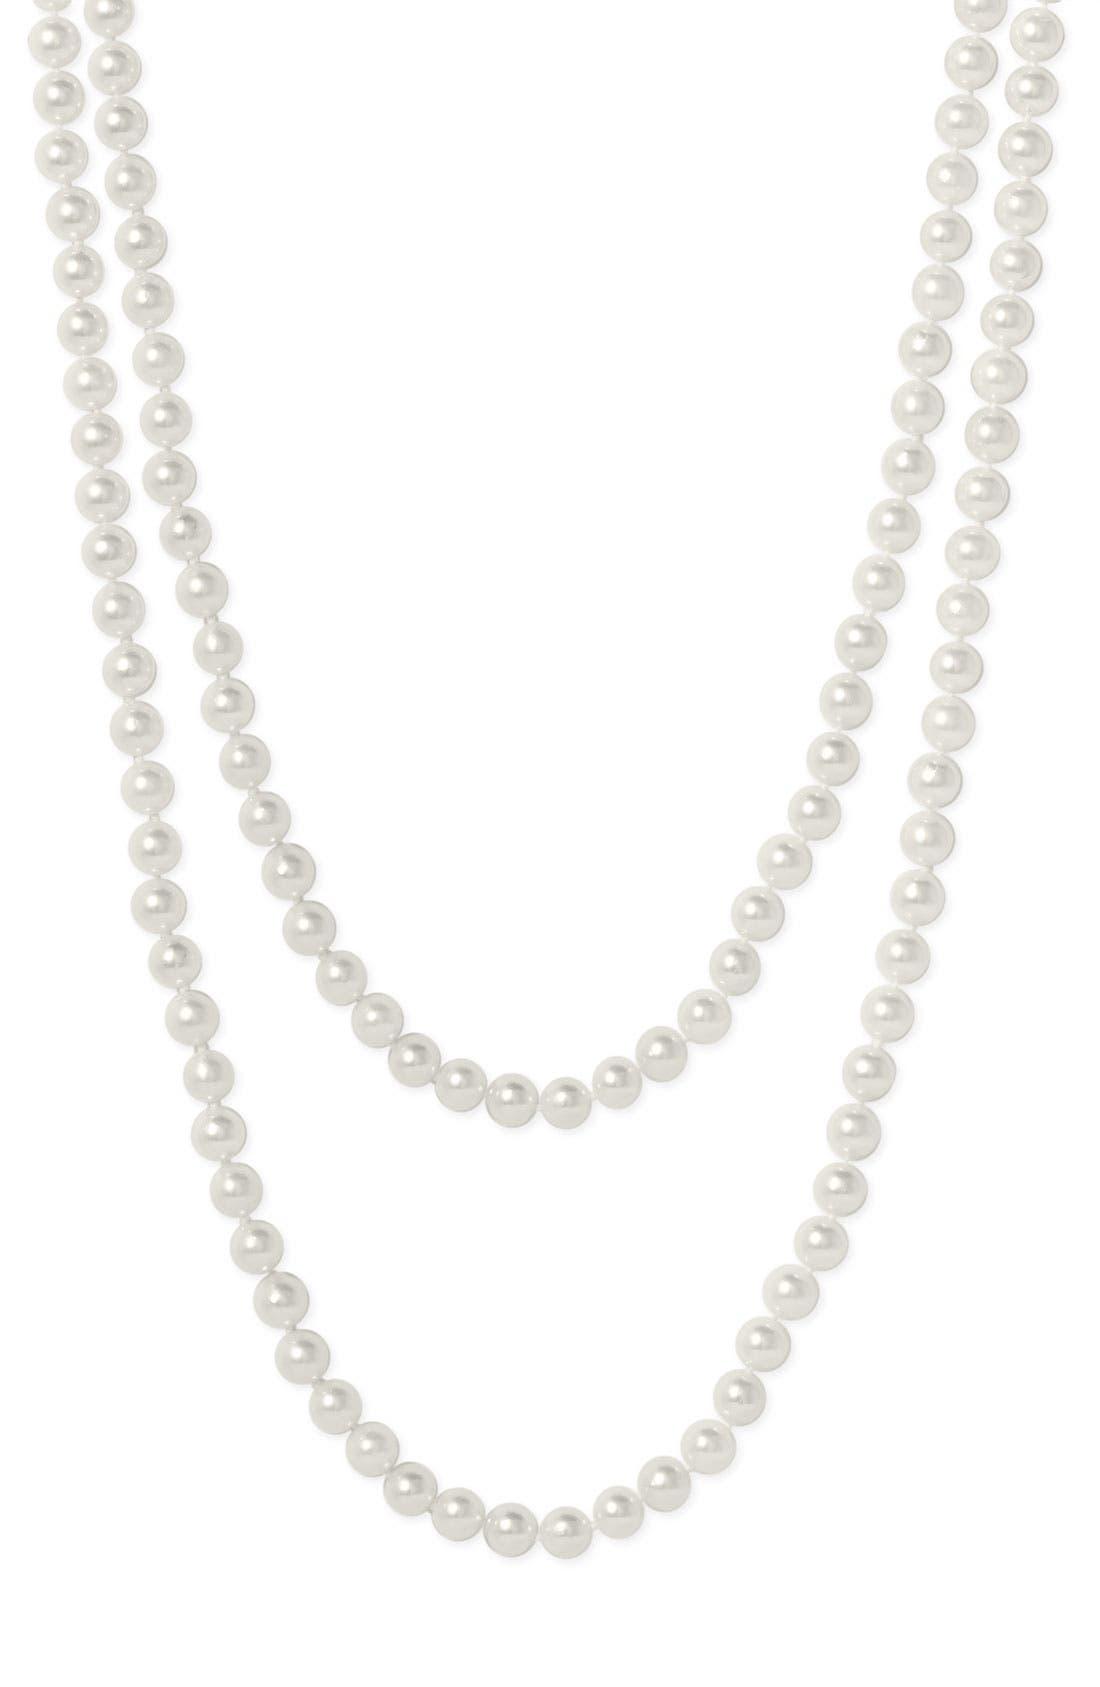 Main Image - Mastoloni Akoya Baroque 7mm Pearl Long Strand Necklace